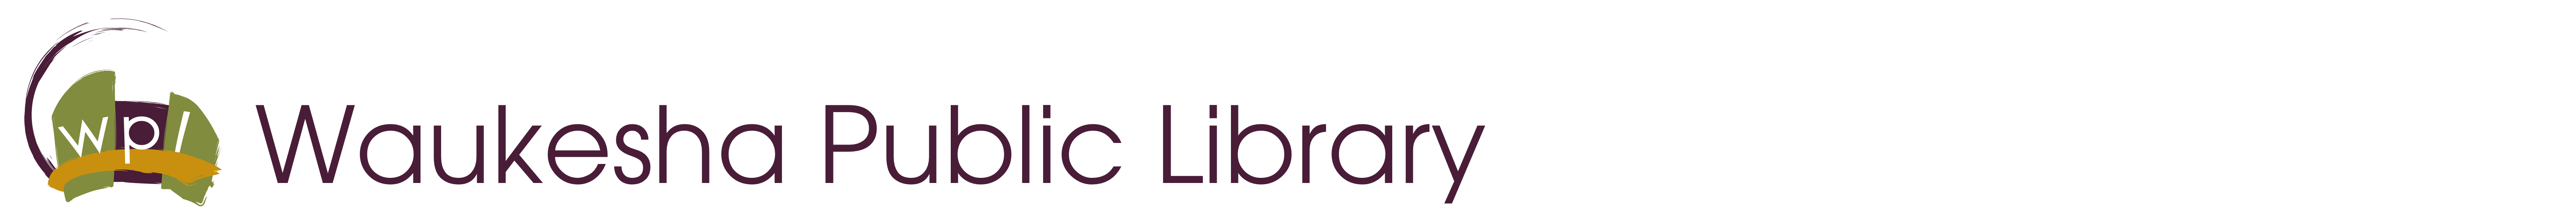 Waukesha Public Library Logo